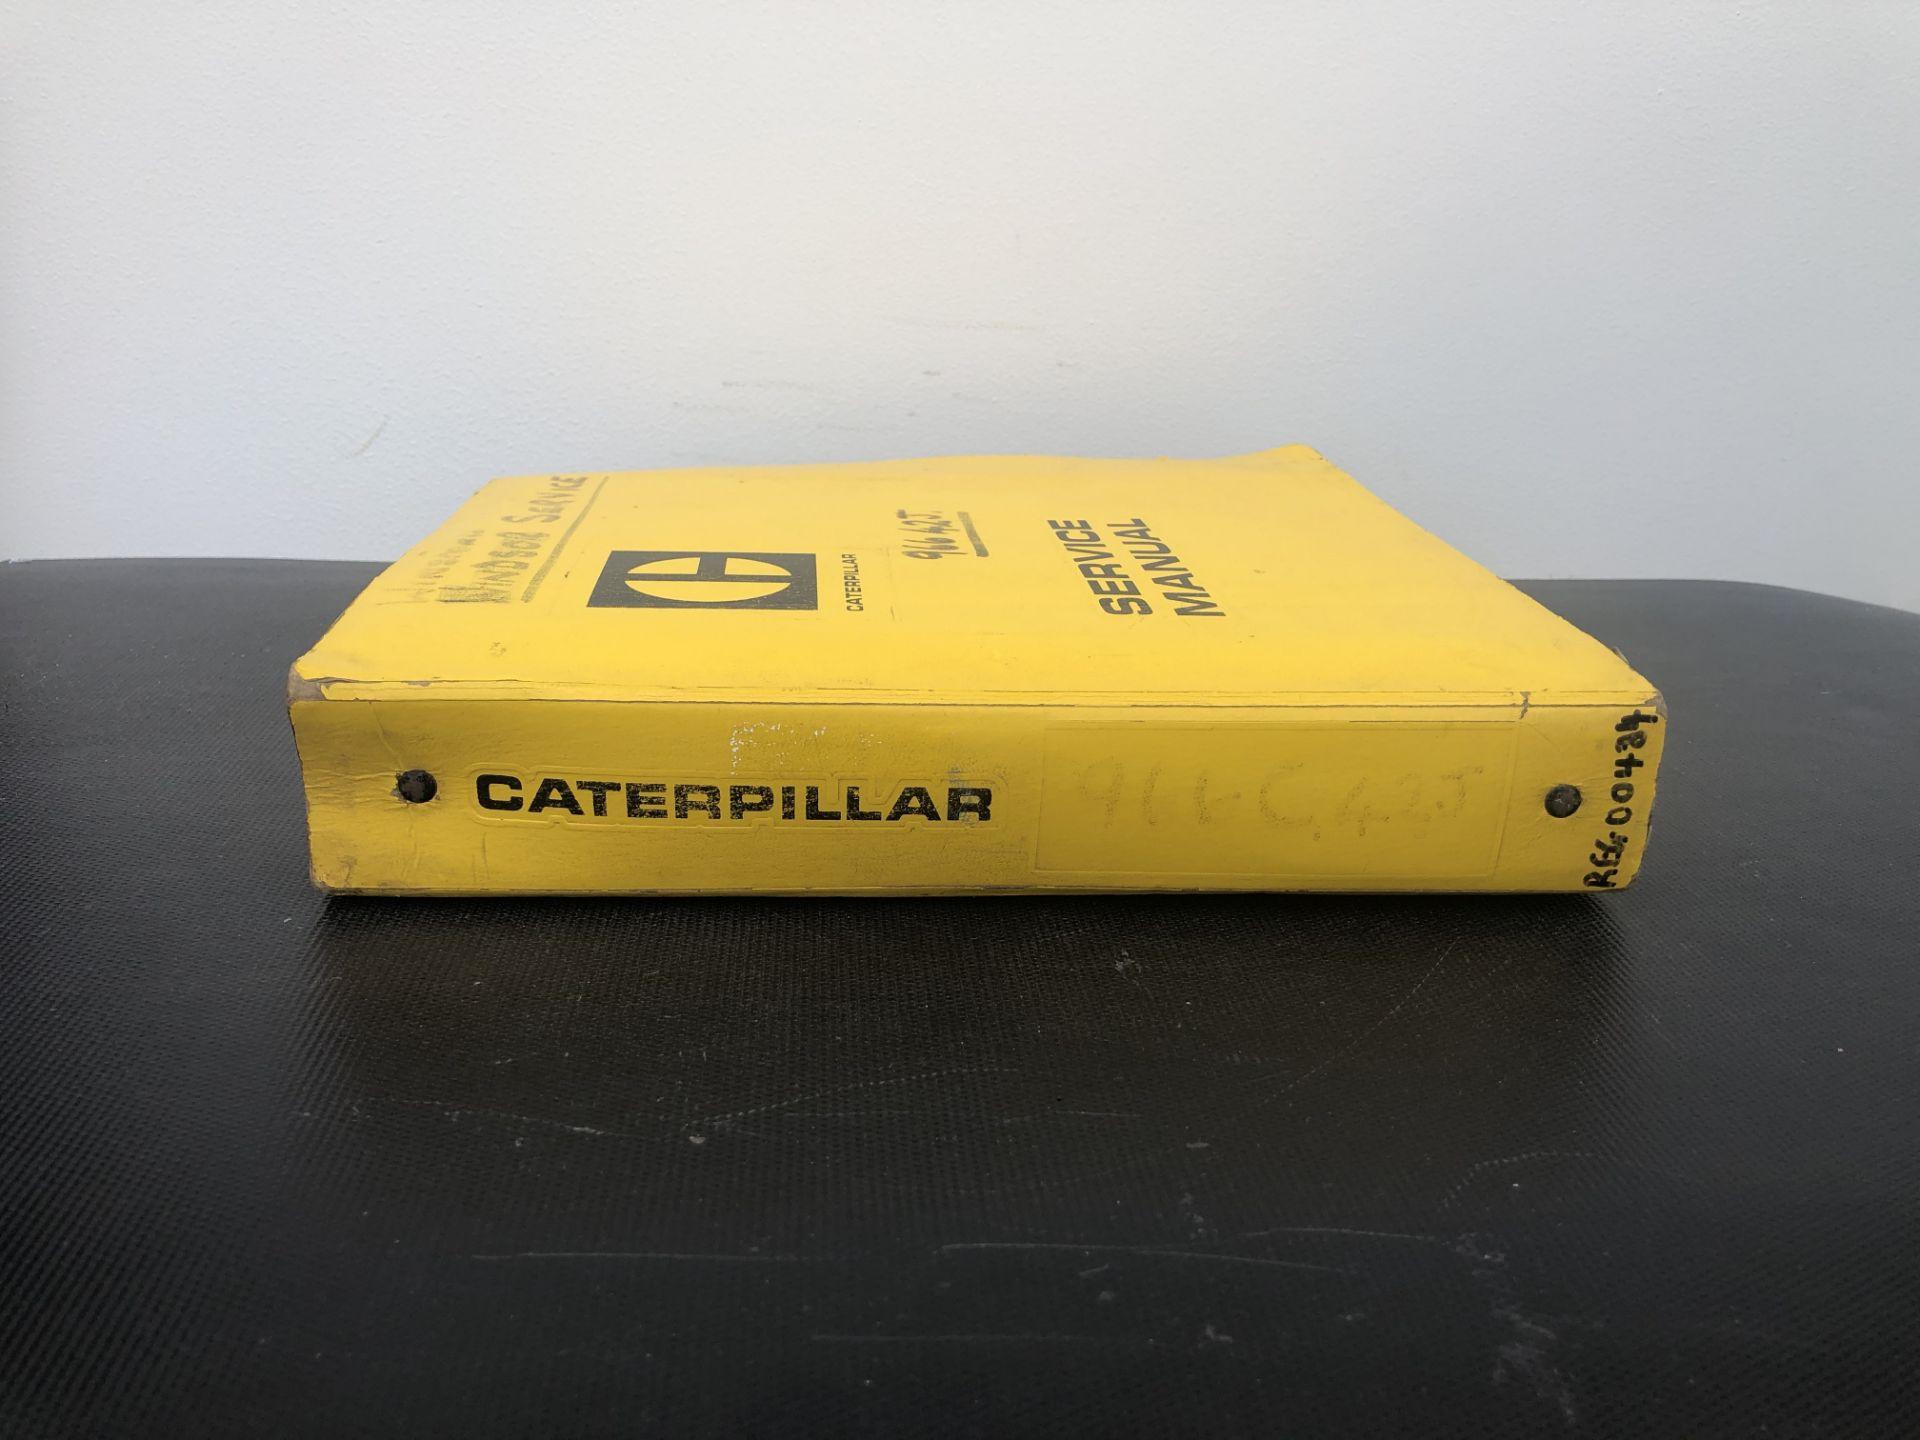 CATERPILLAR CB214C CB224C SERVICE MANUAL, GENUINE FACTORY CAT WORKSHOP MANUAL